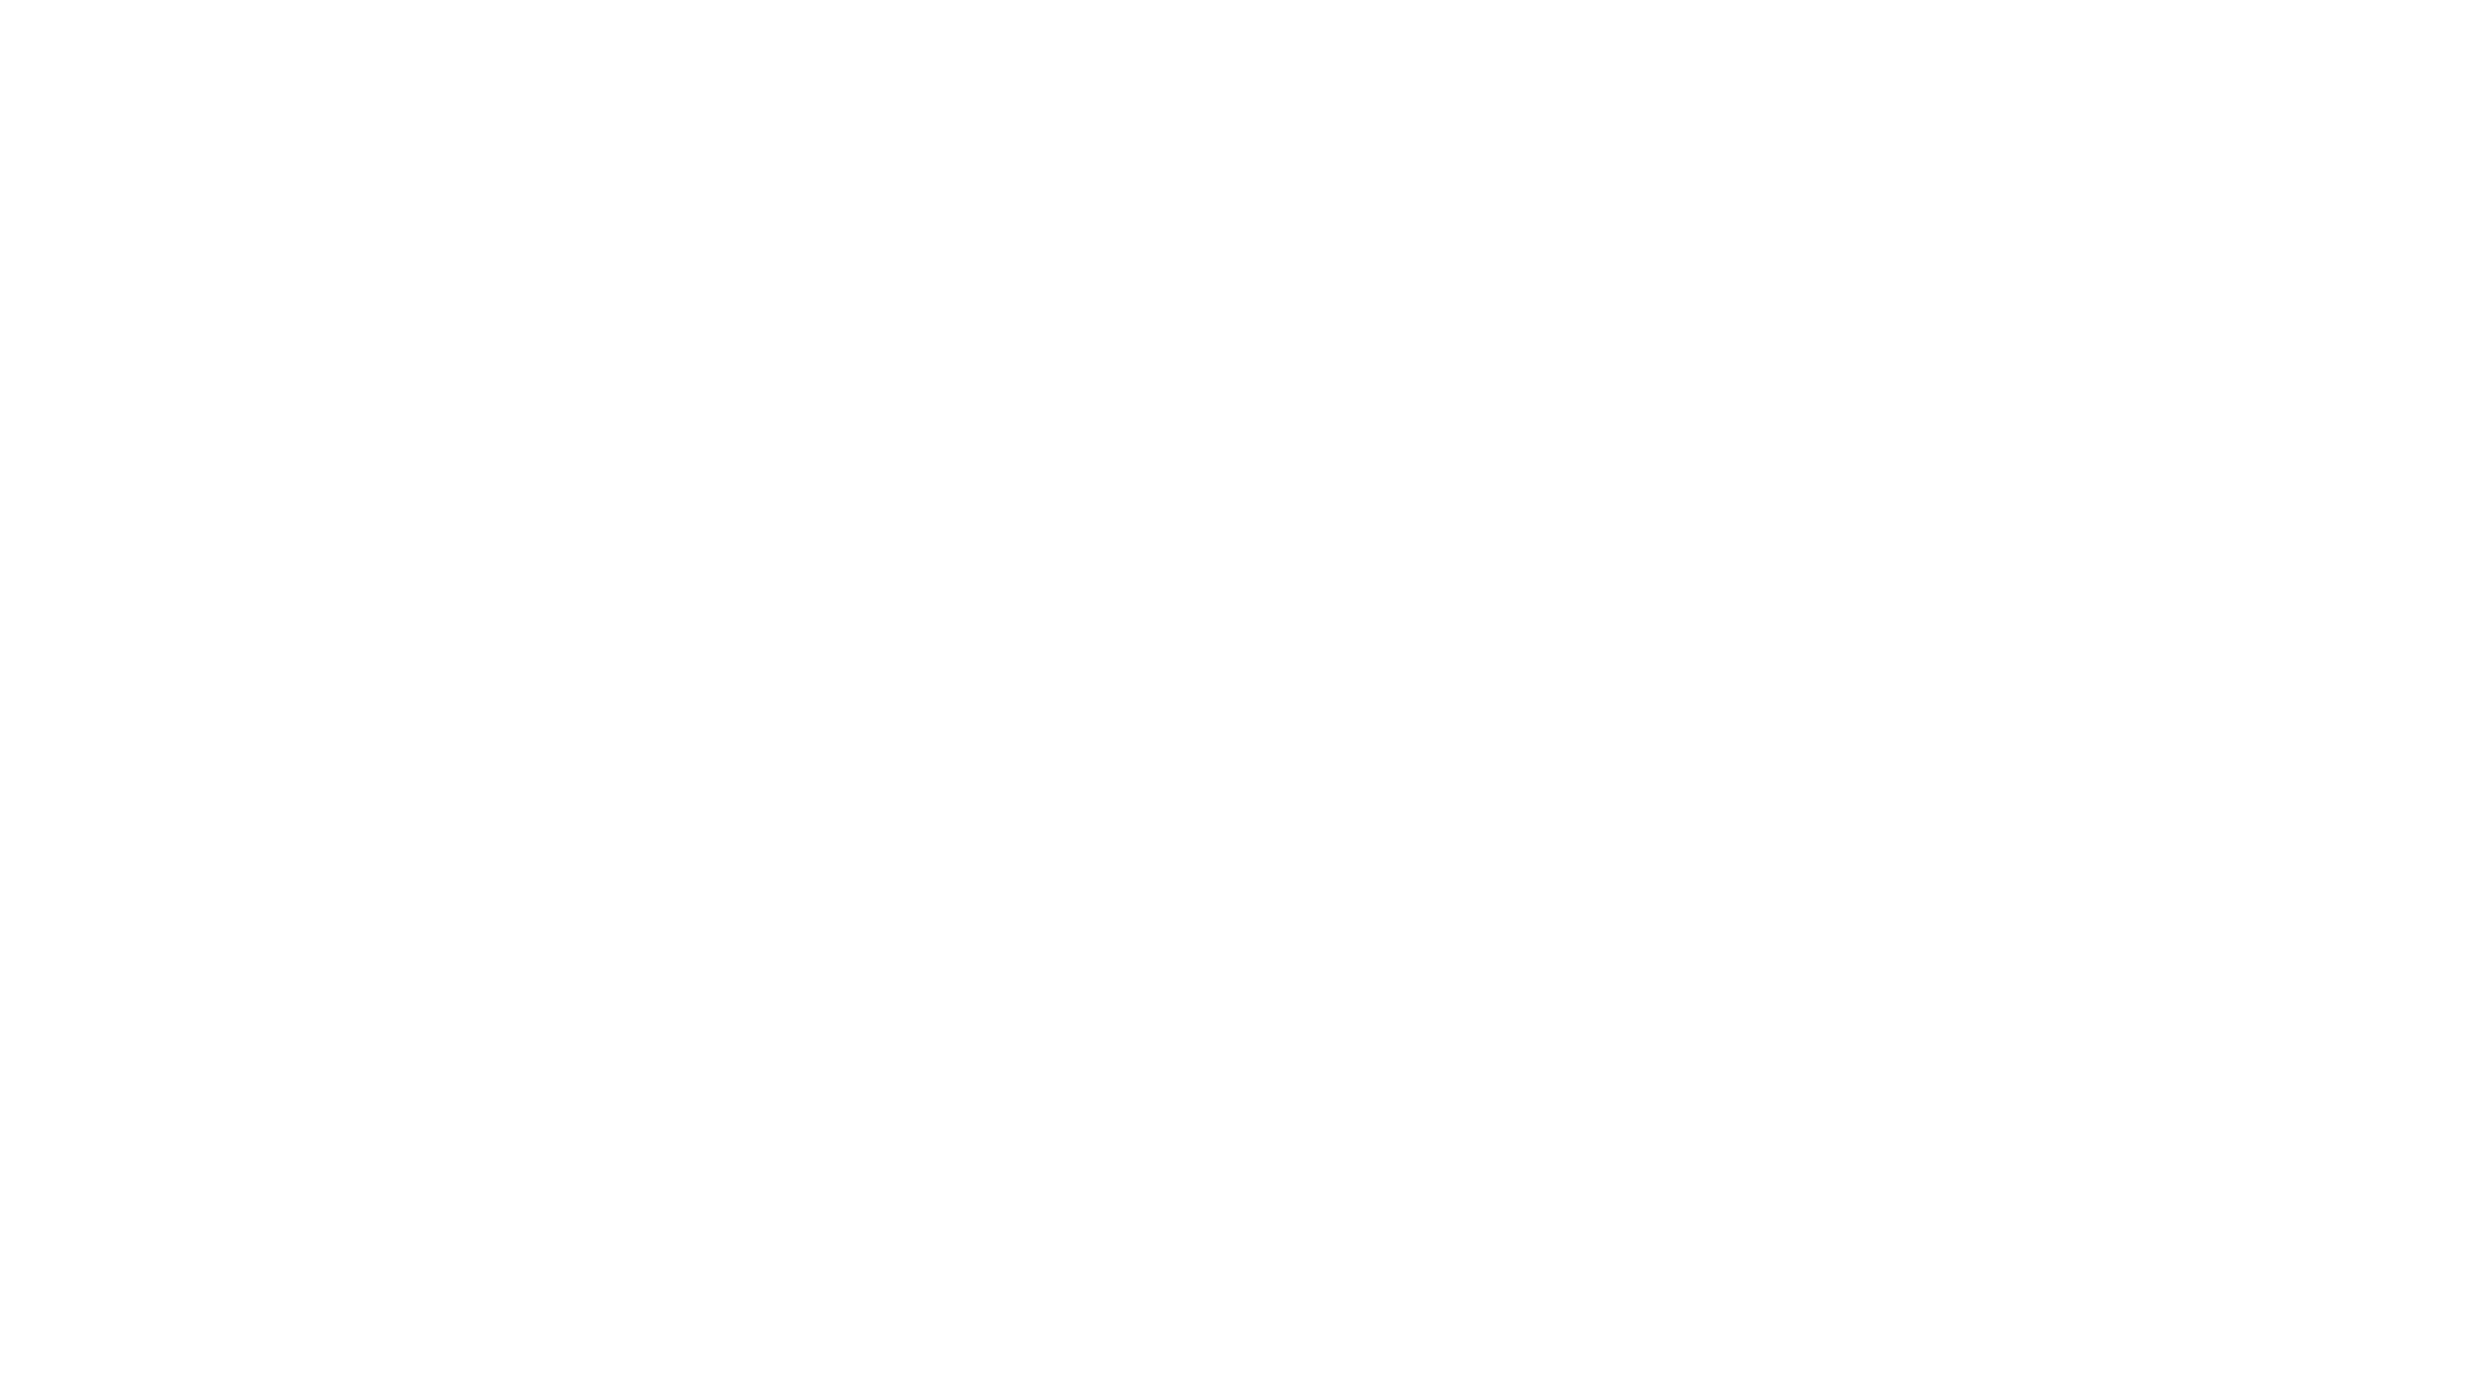 stellarcommanders_logo_neg_2488x1400.png